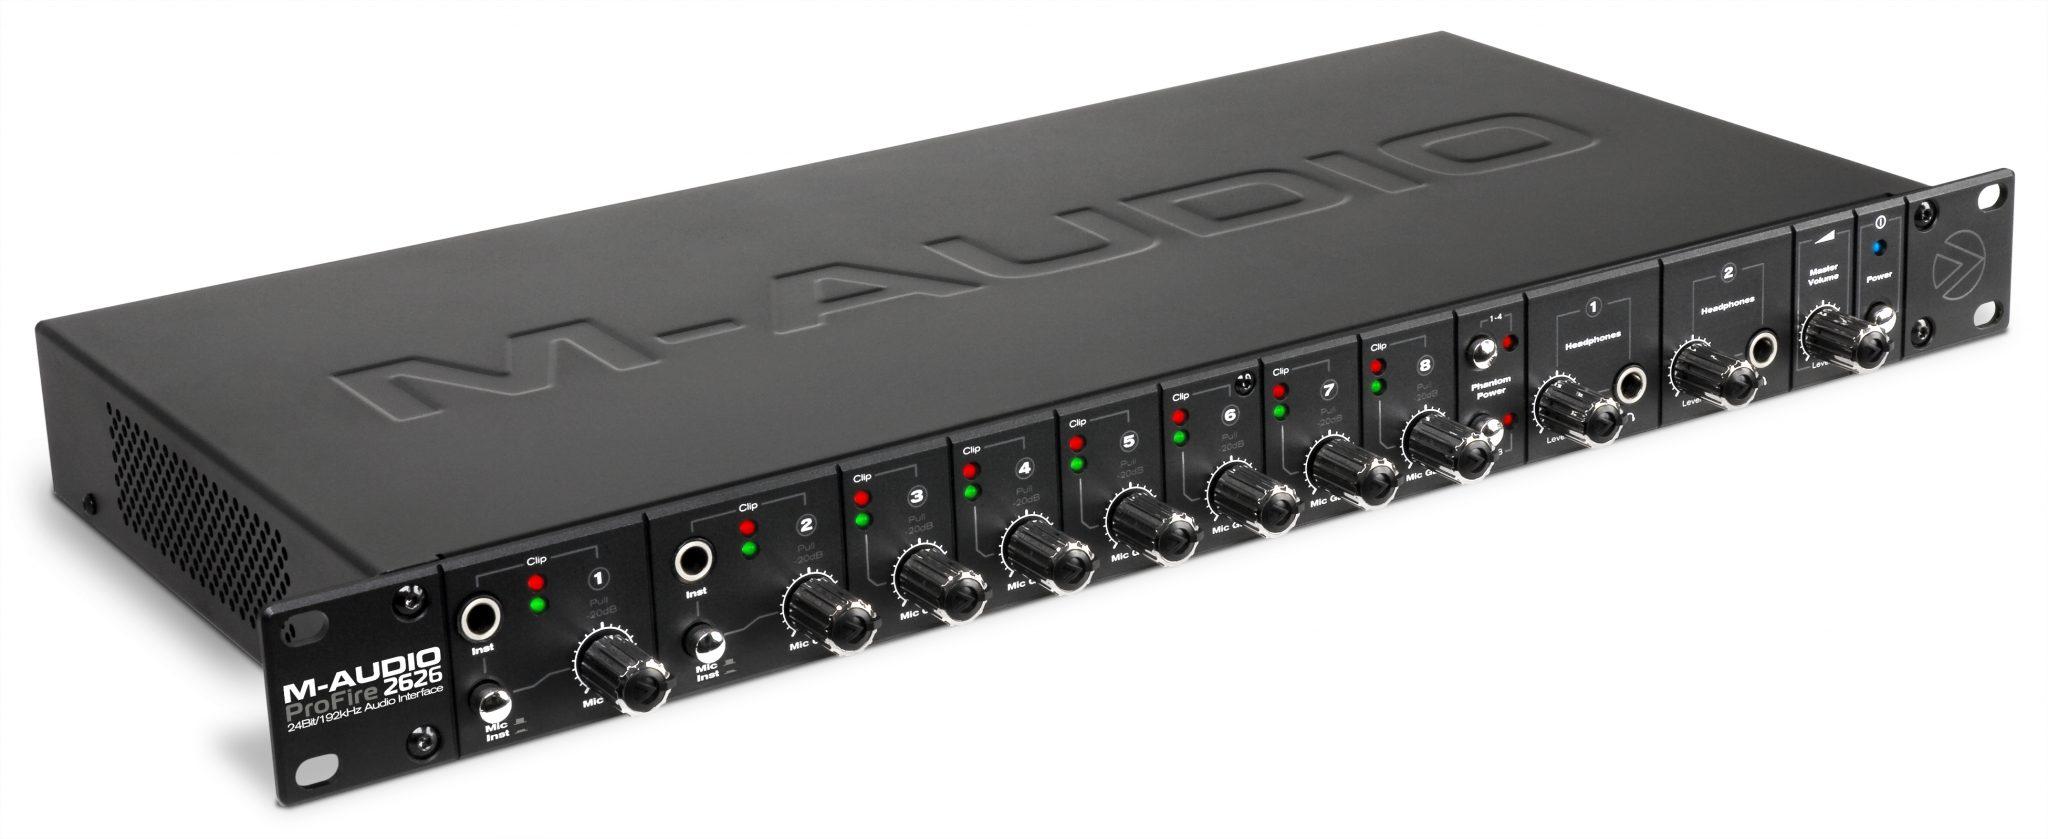 m-audio profire 2626 yosemite drivers